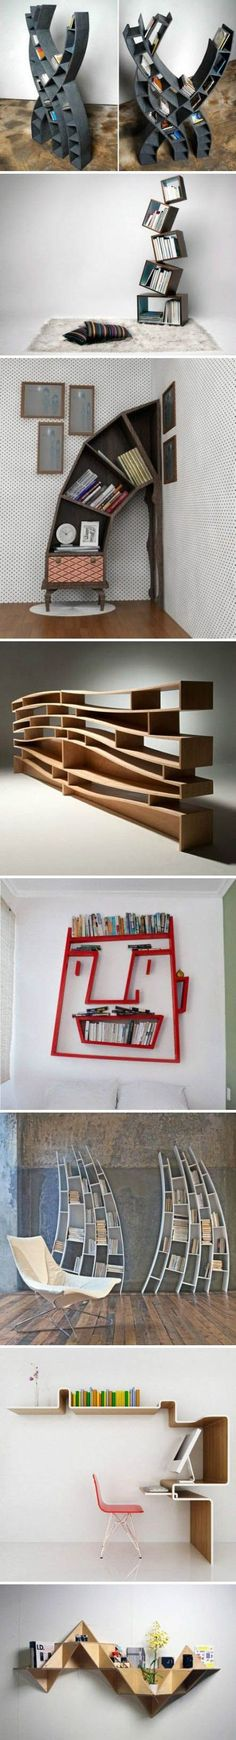 Cool Bookshelf | DIY Crafts Tutorials